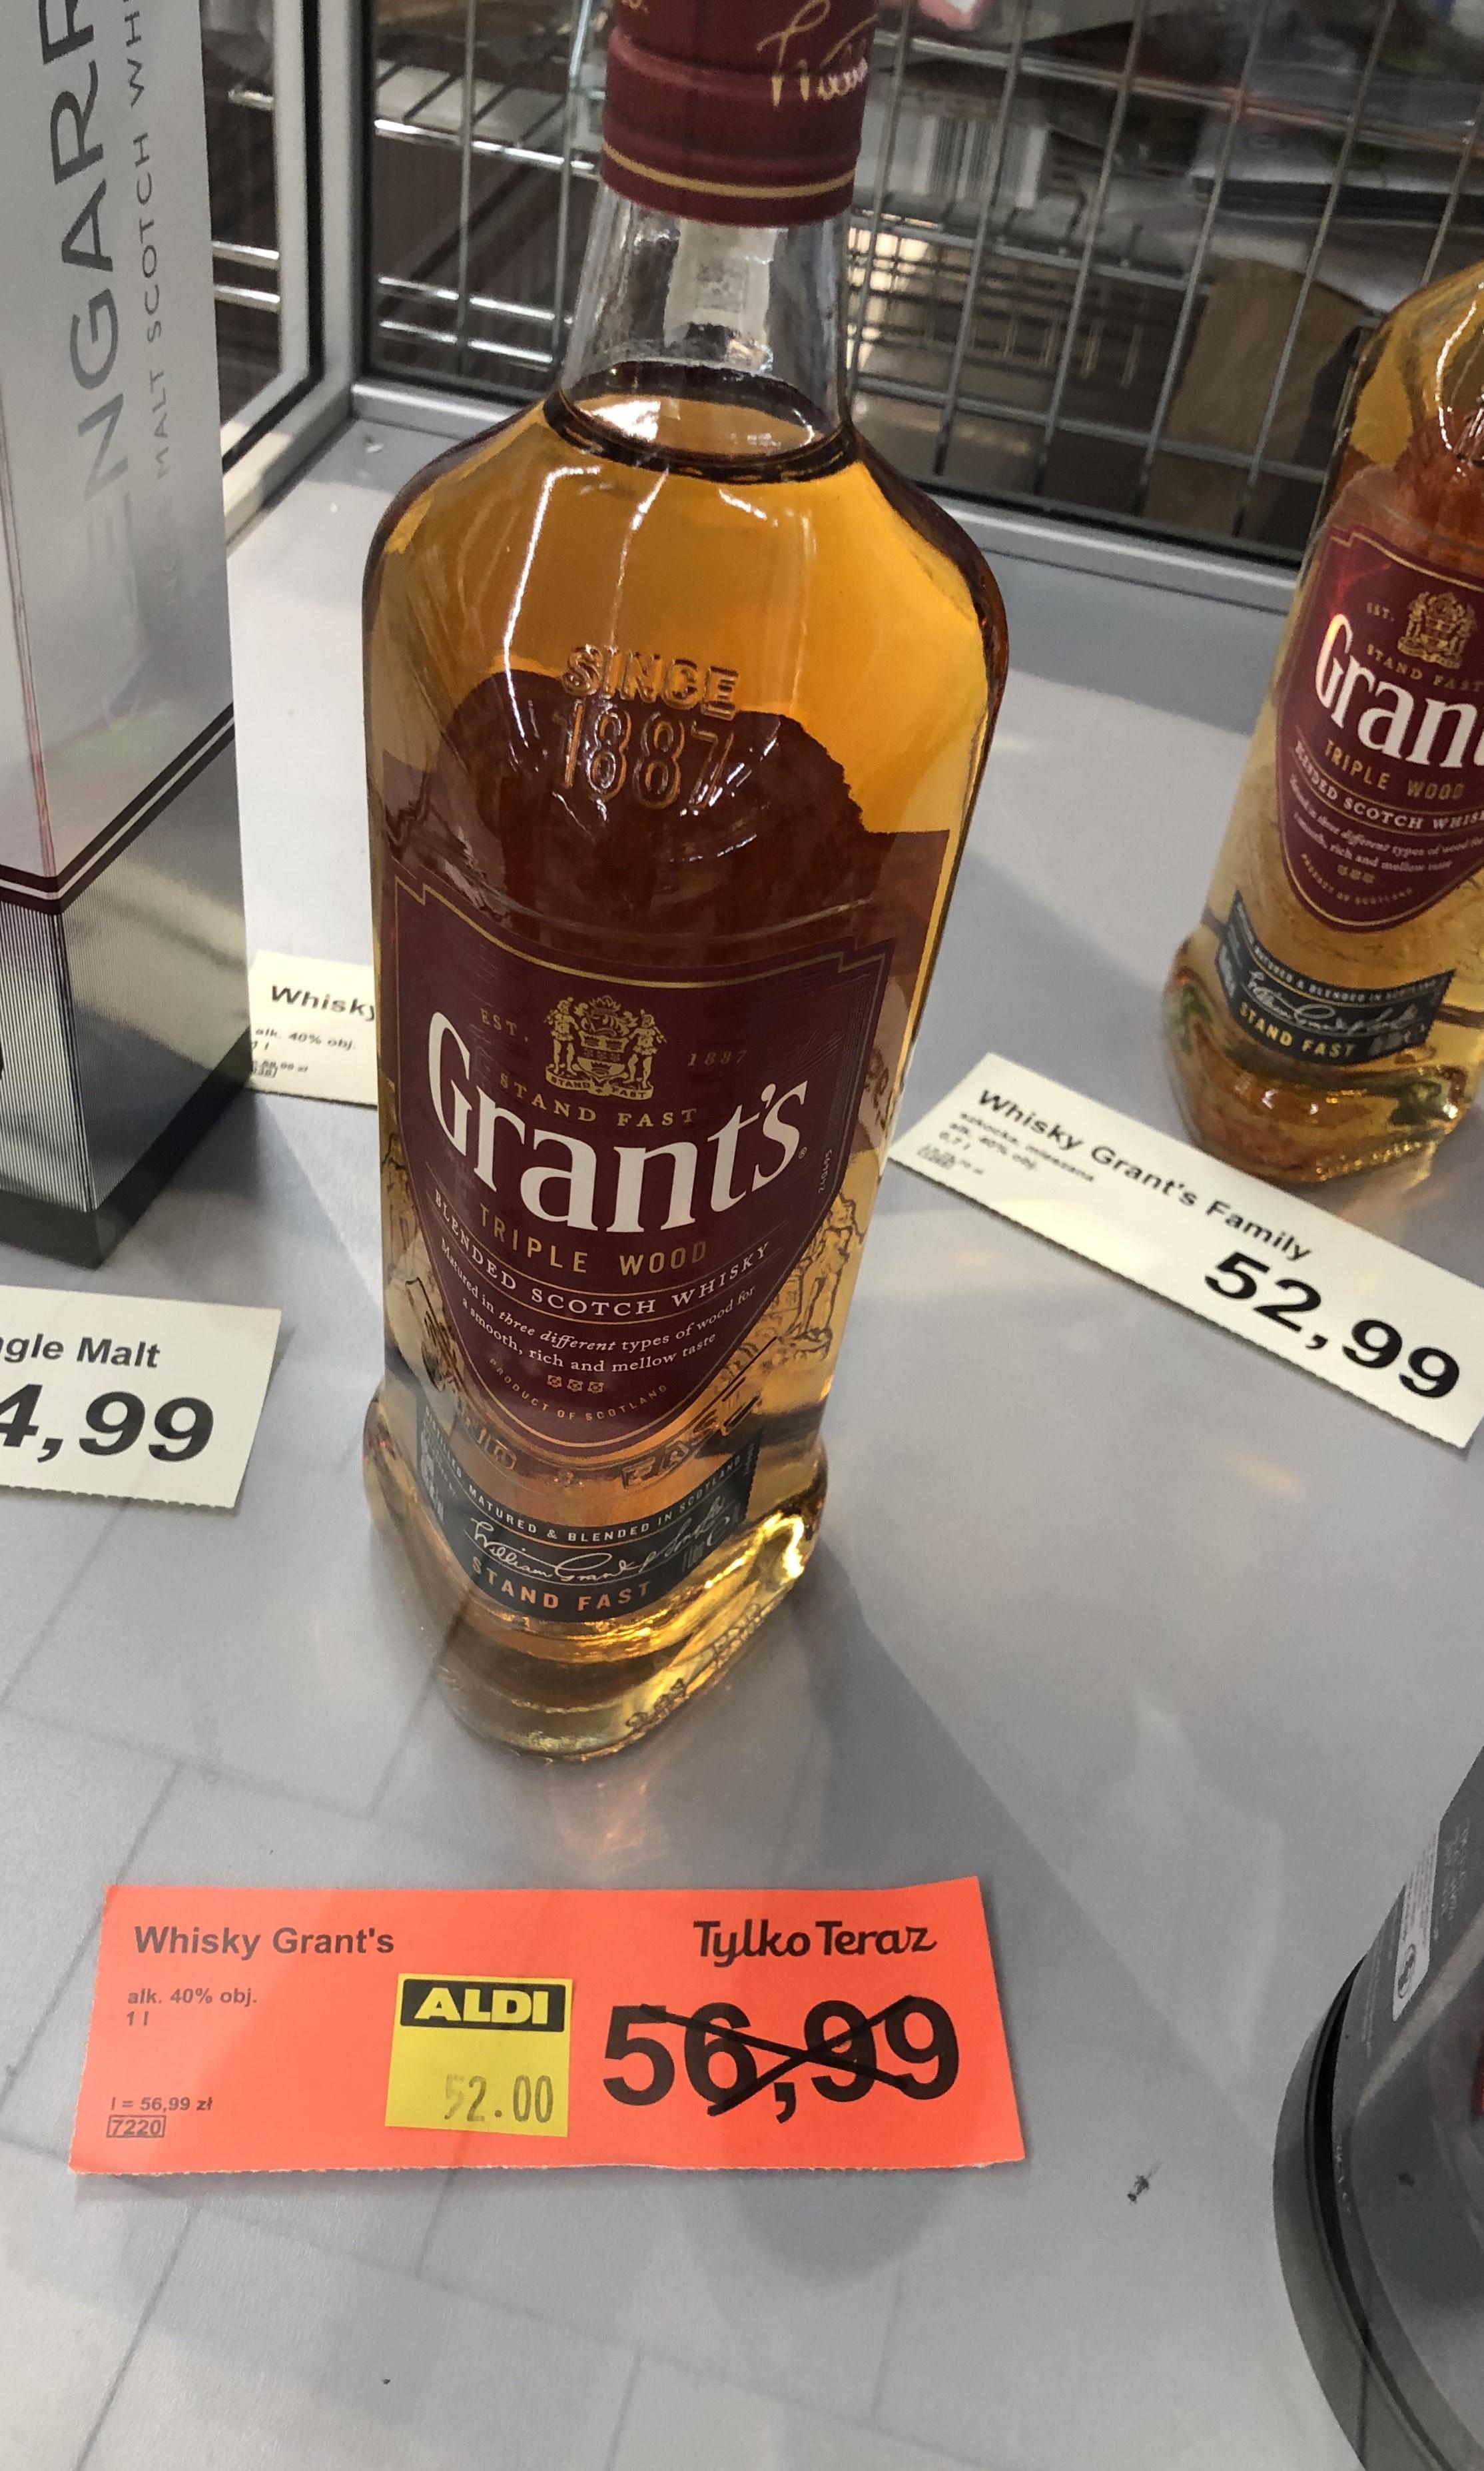 Whisky Grants 1 l. za 52 zł Aldi